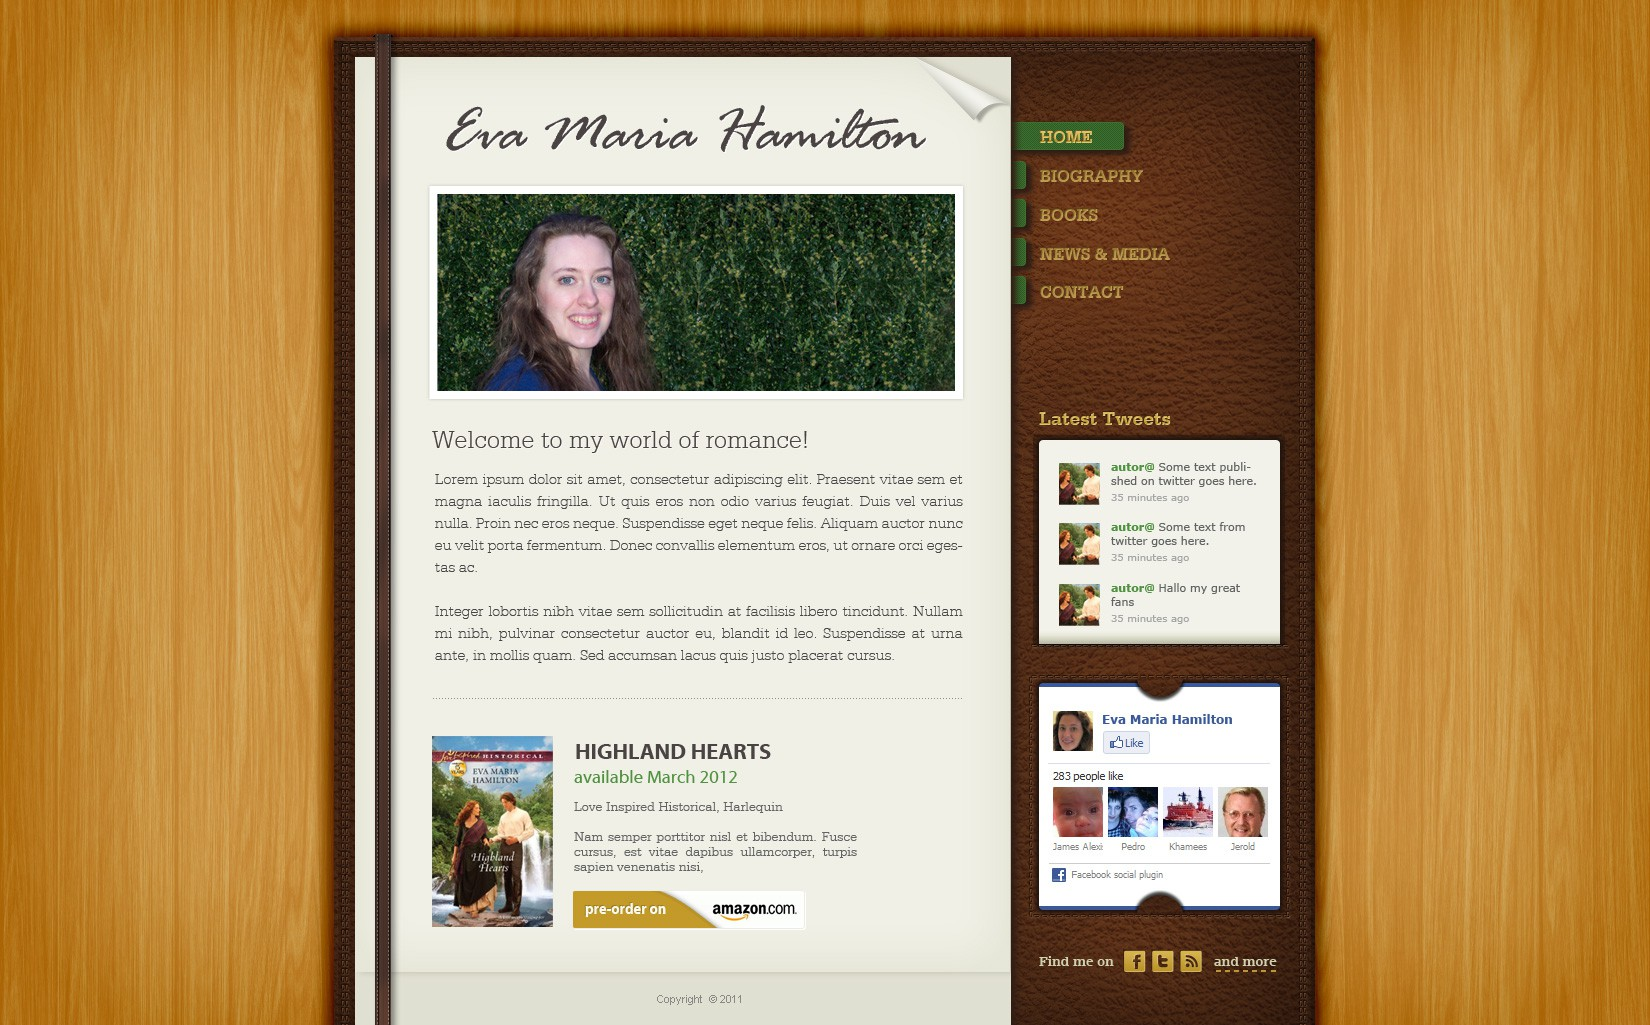 New Homepage for Harlequin Author - Eva Maria Hamilton